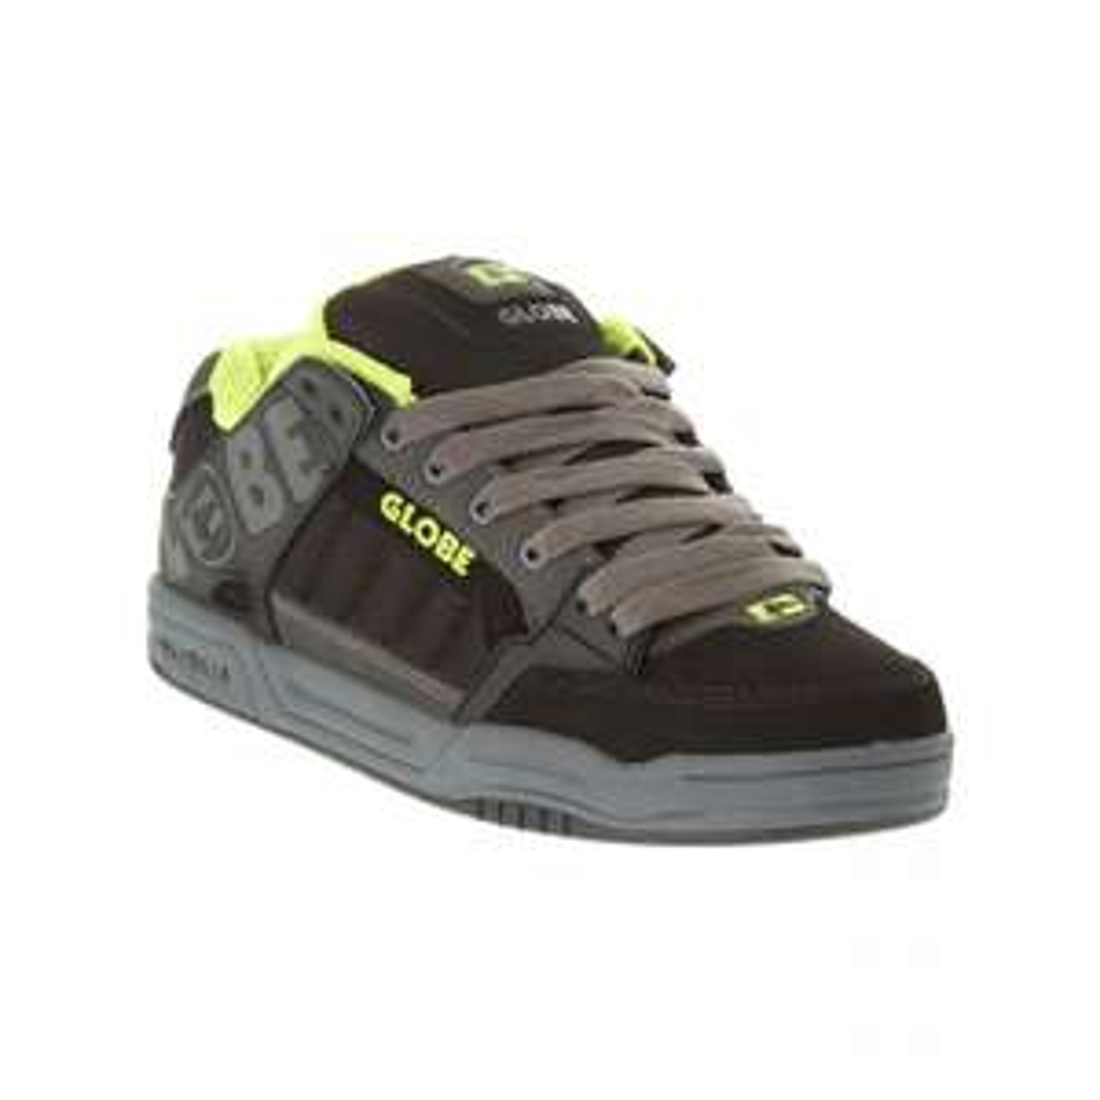 Chaussures Globe Tilt Charcoal Blk Lime